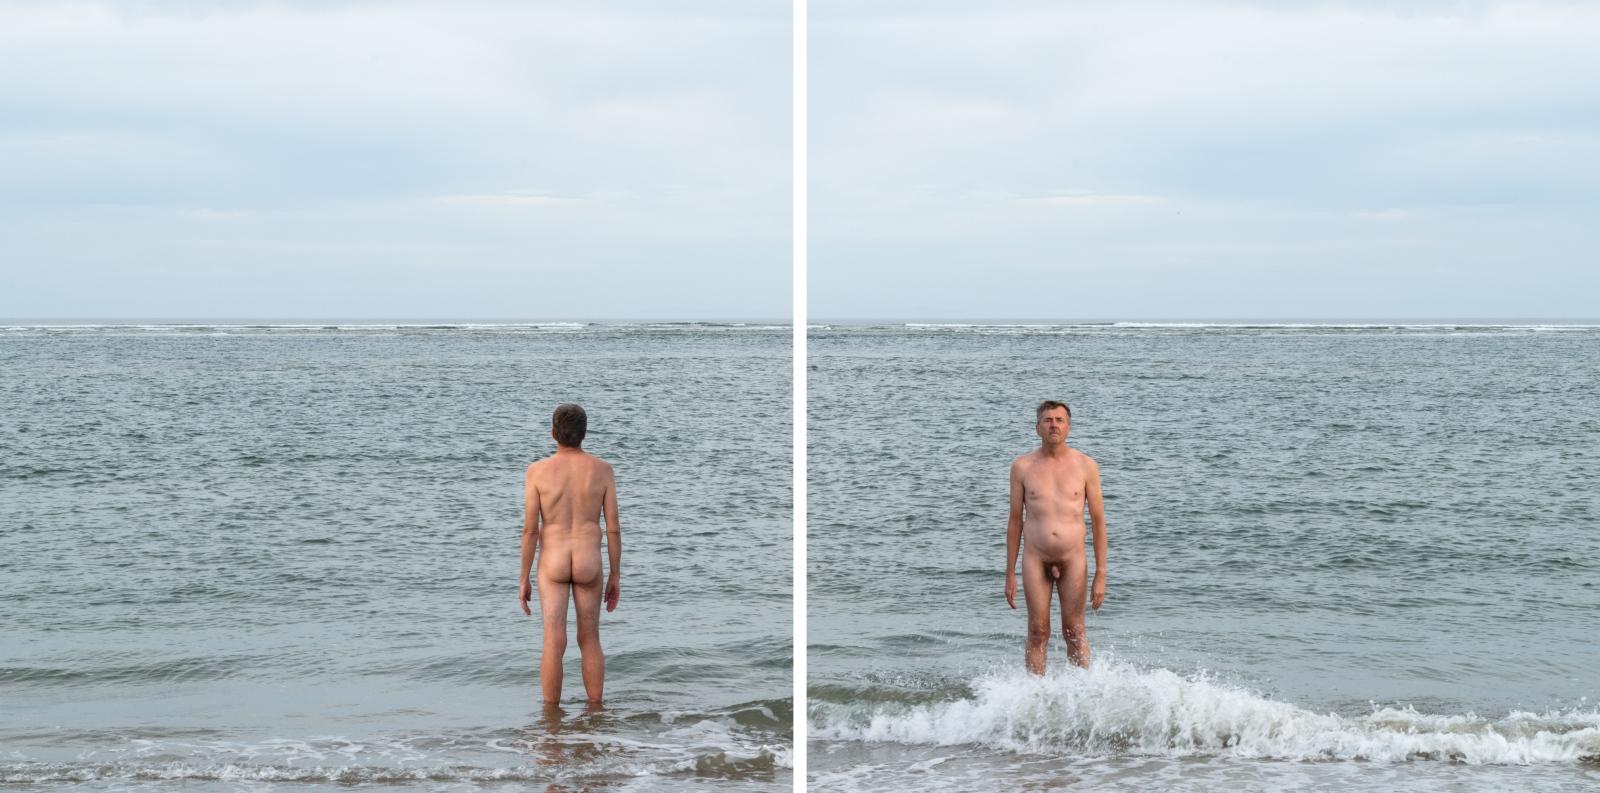 Art and Documentary Photography - Loading 2xdrakesbeach-2.jpg